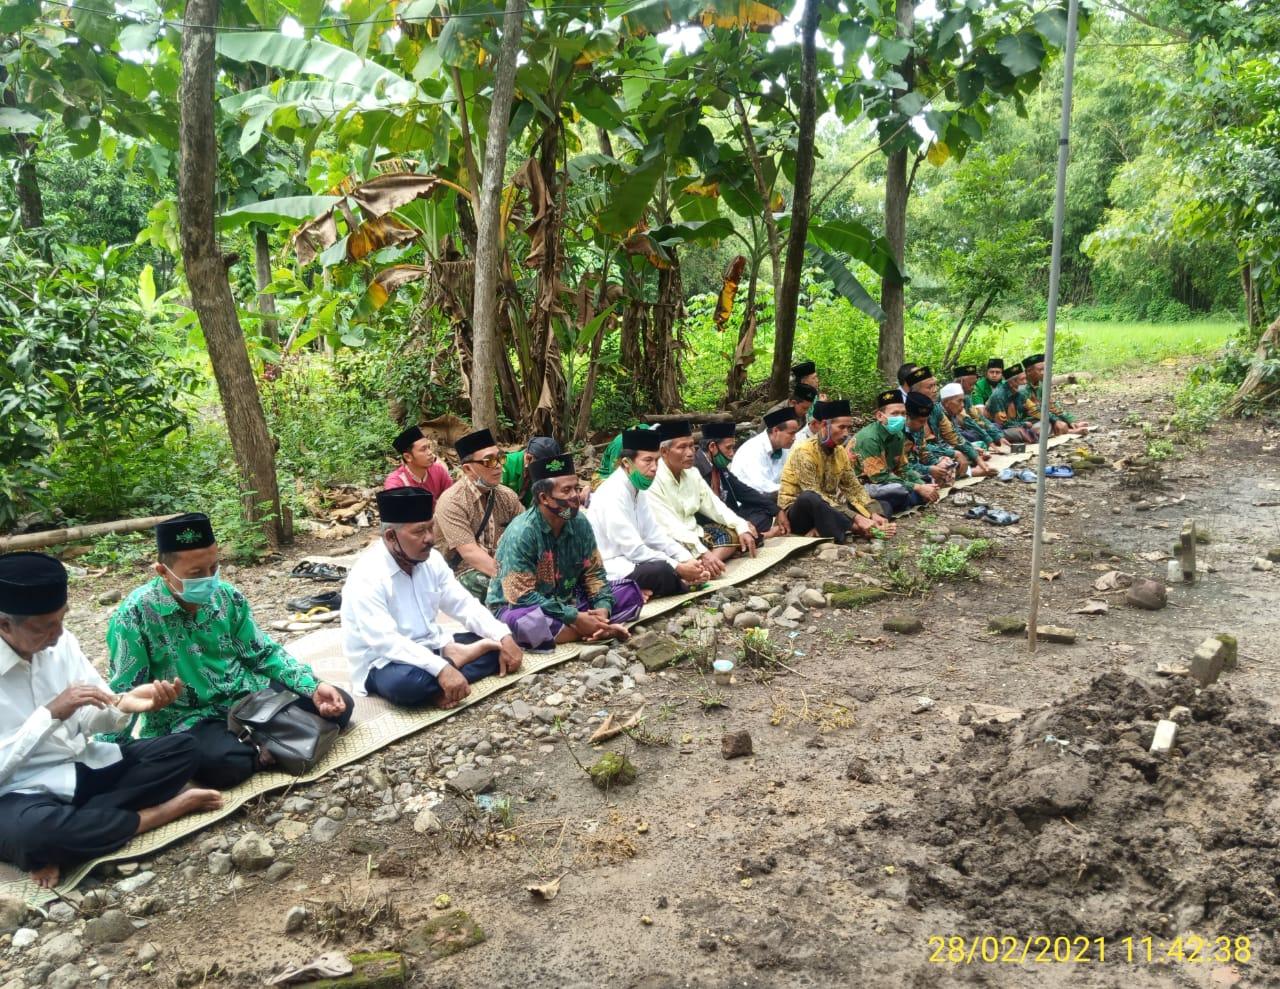 Jajaran Pengurus MWC NU Siman tengah berziarah di makam muassis NU setempat